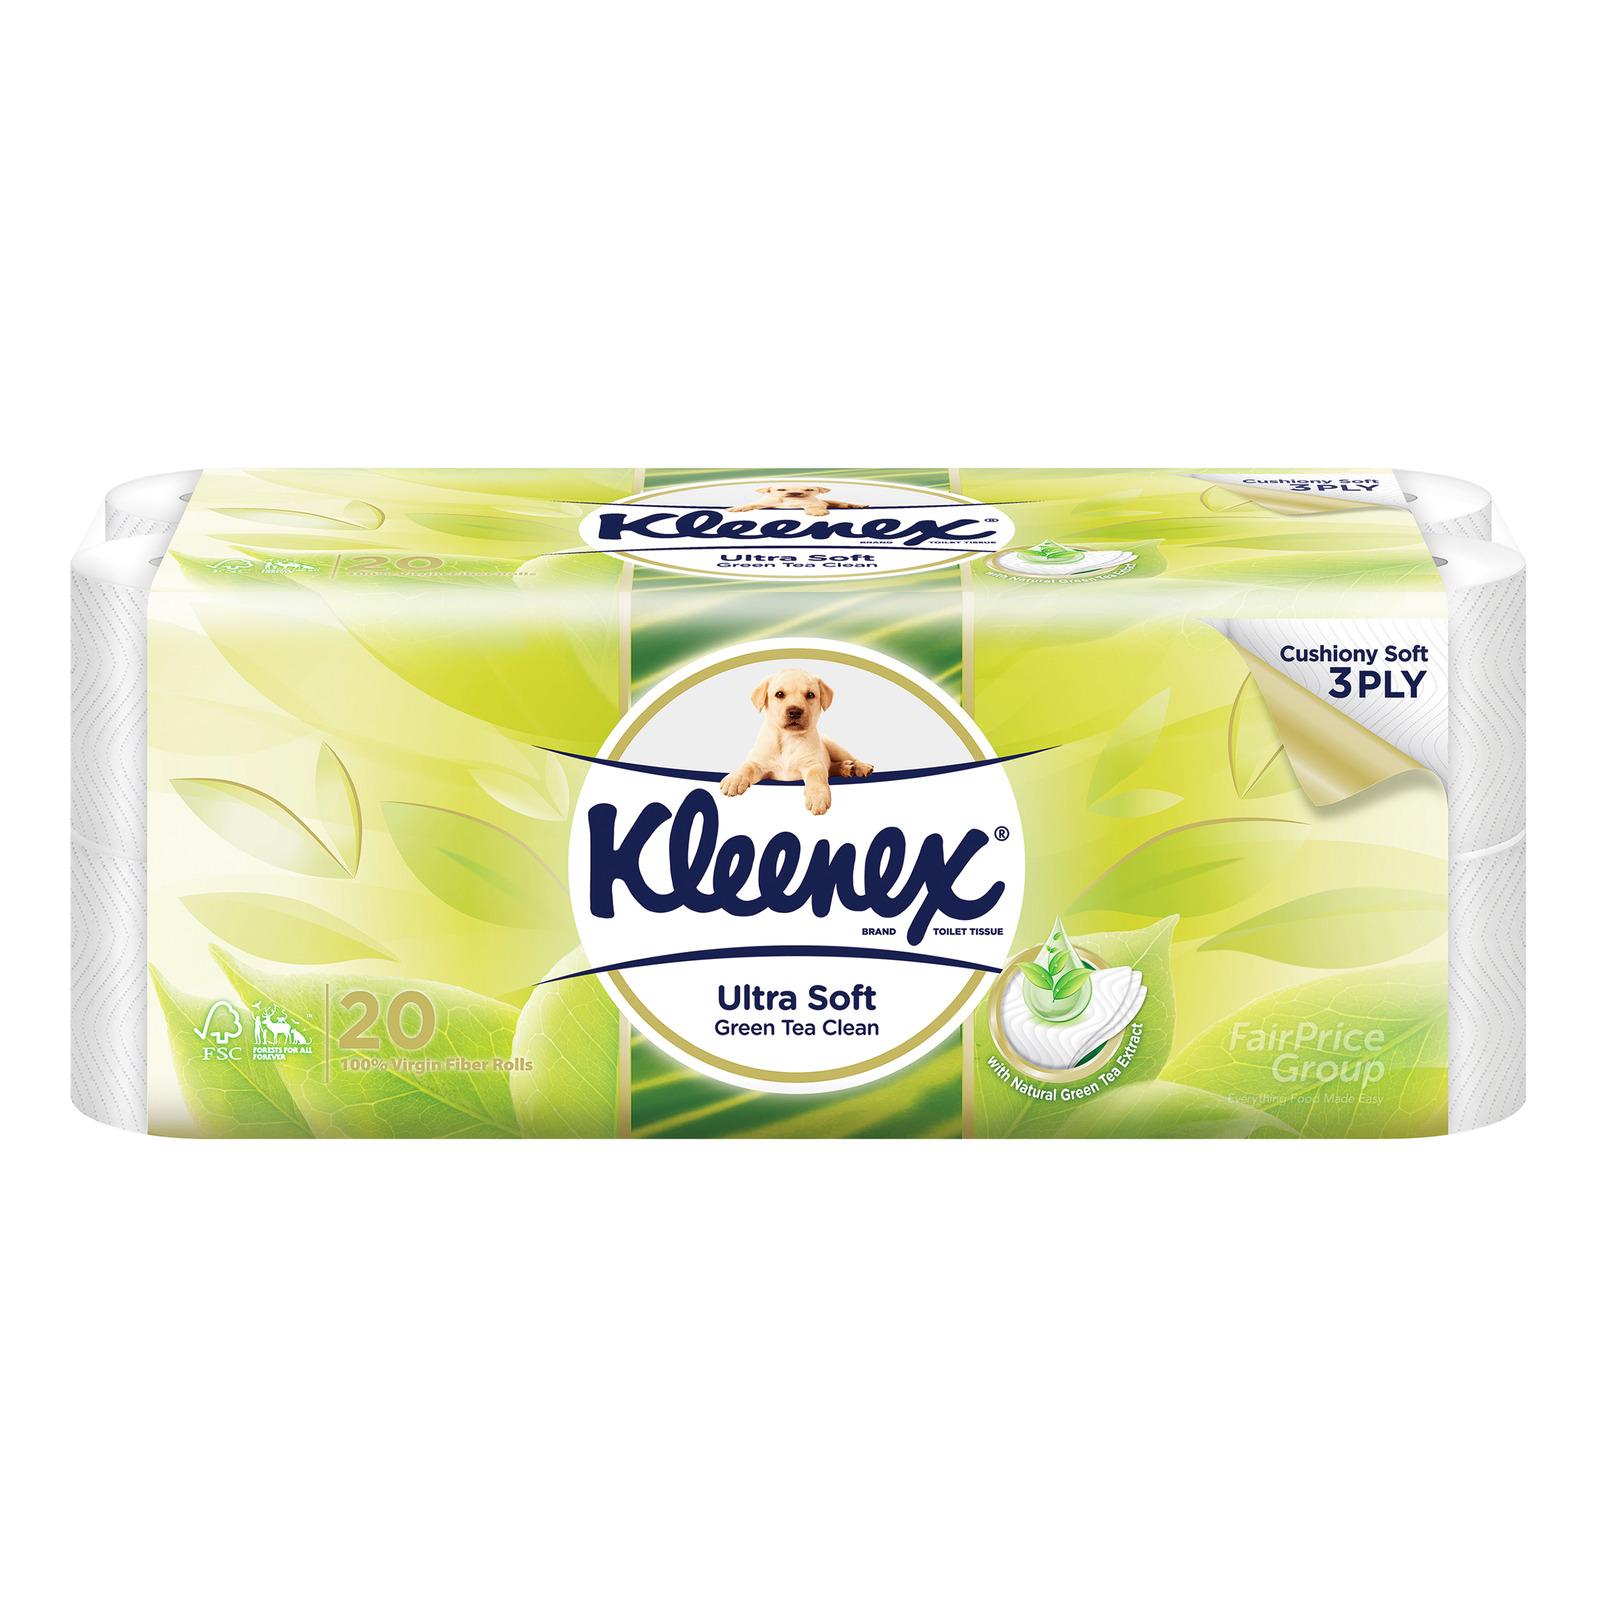 Kleenex Clean Care Toilet Tissue Rolls - Green Tea